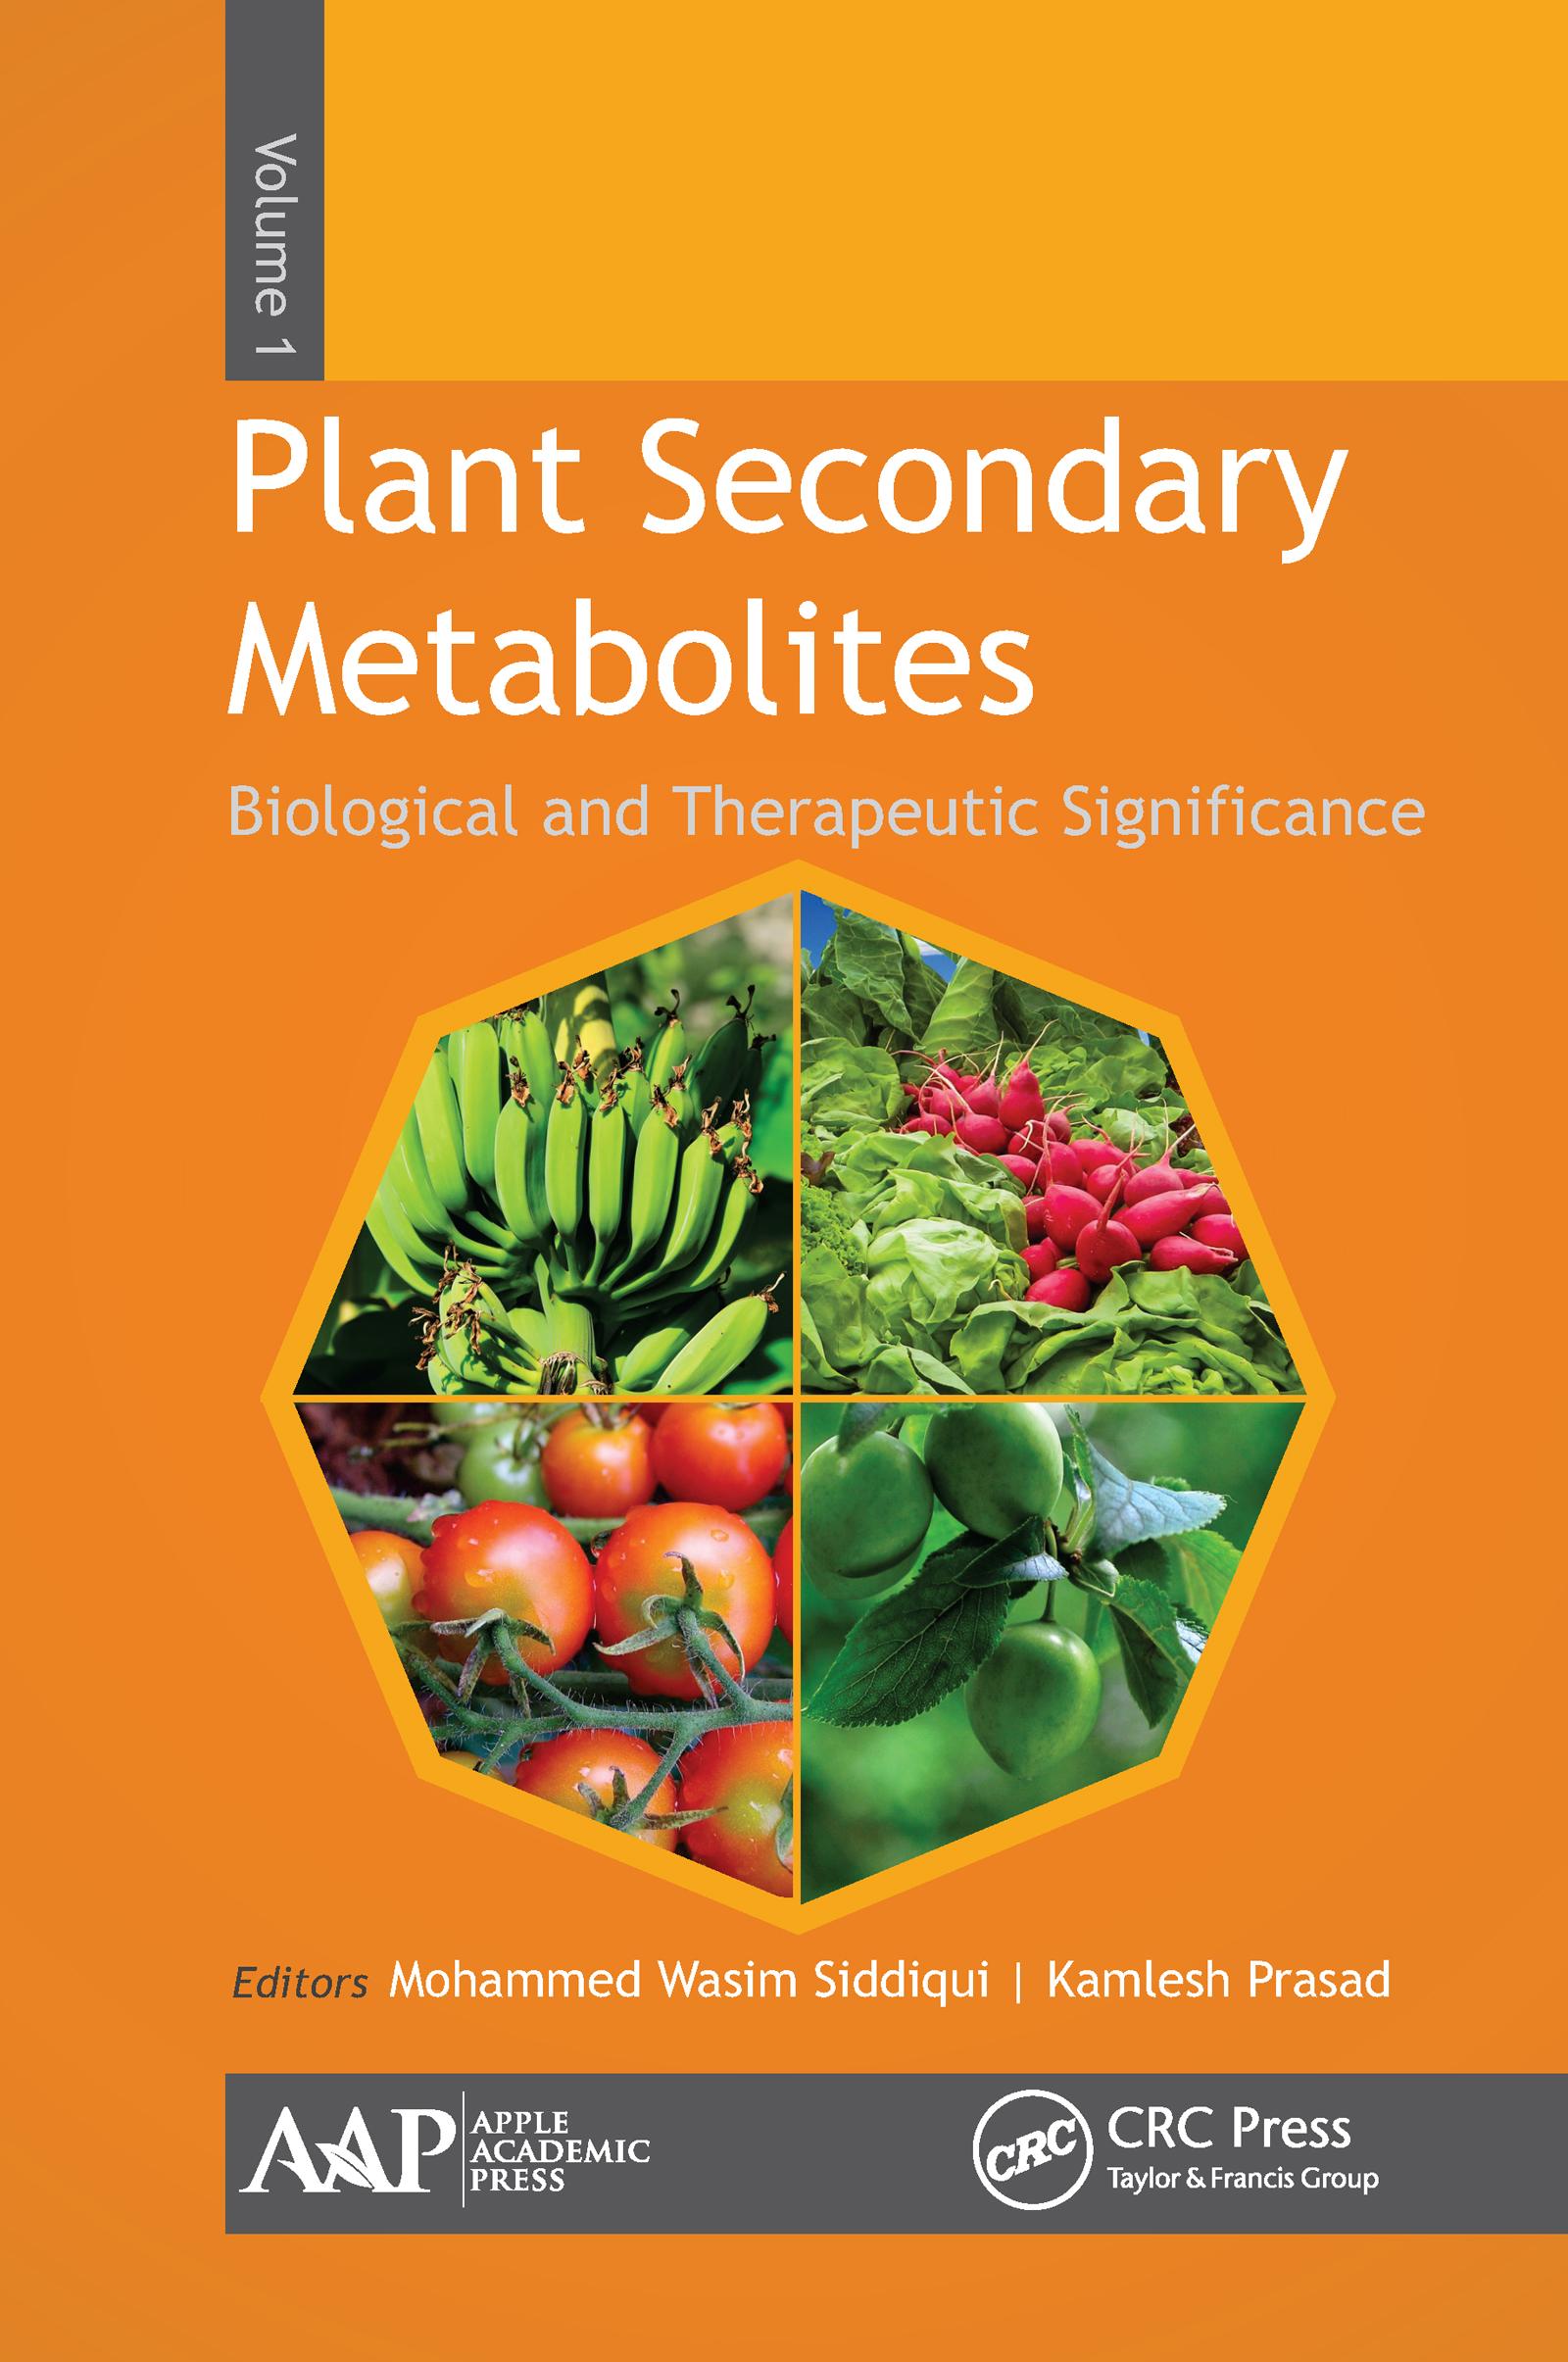 Plant Secondary Metabolites, Volume One